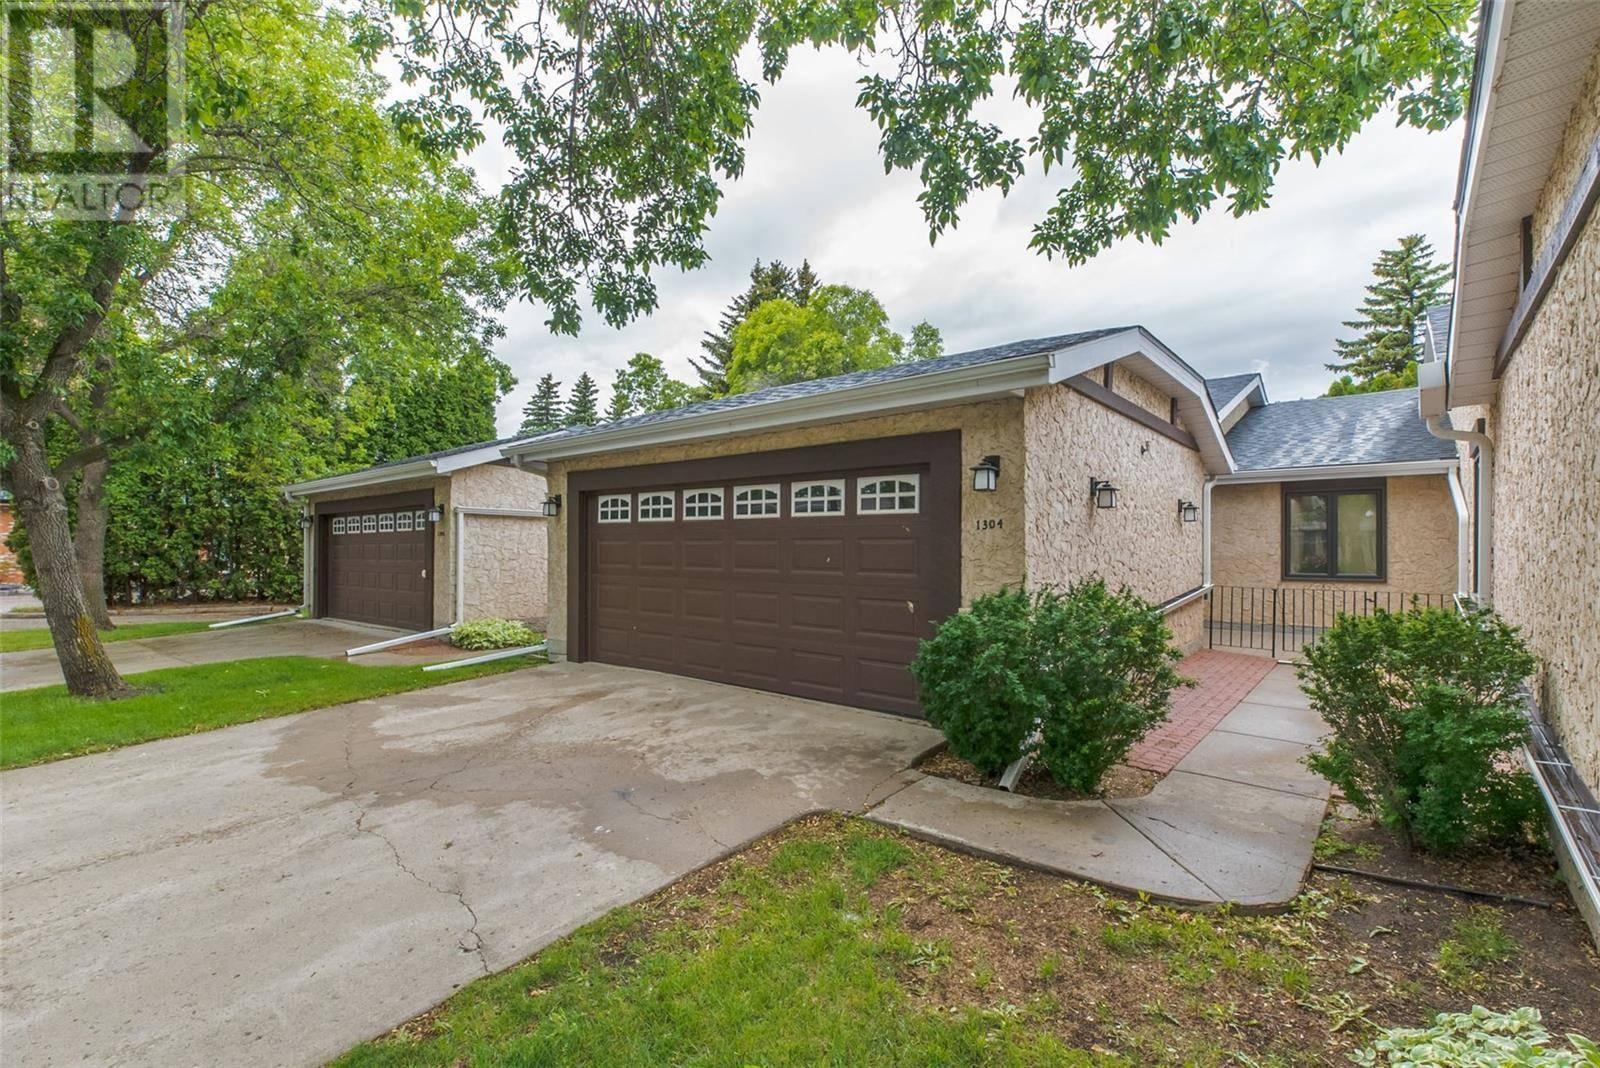 Townhouse for sale at 1304 Gryphons Wk Regina Saskatchewan - MLS: SK777515